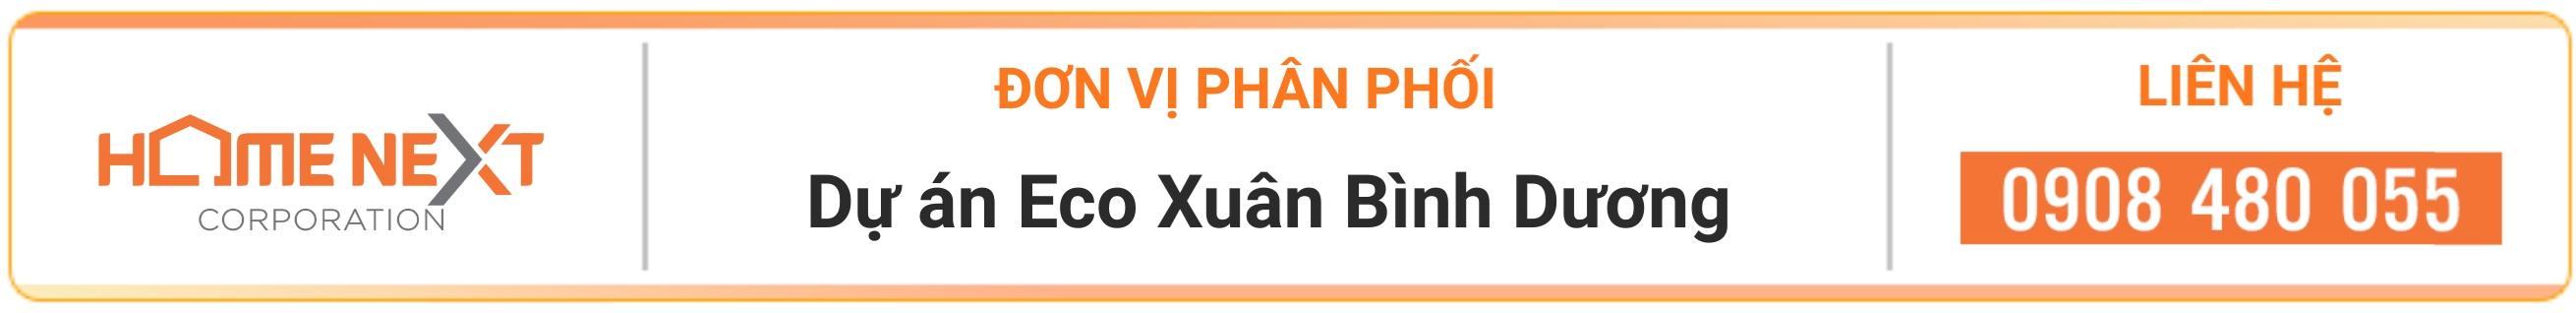 -banner-don-vi-phan-phoi-ecoxuan-